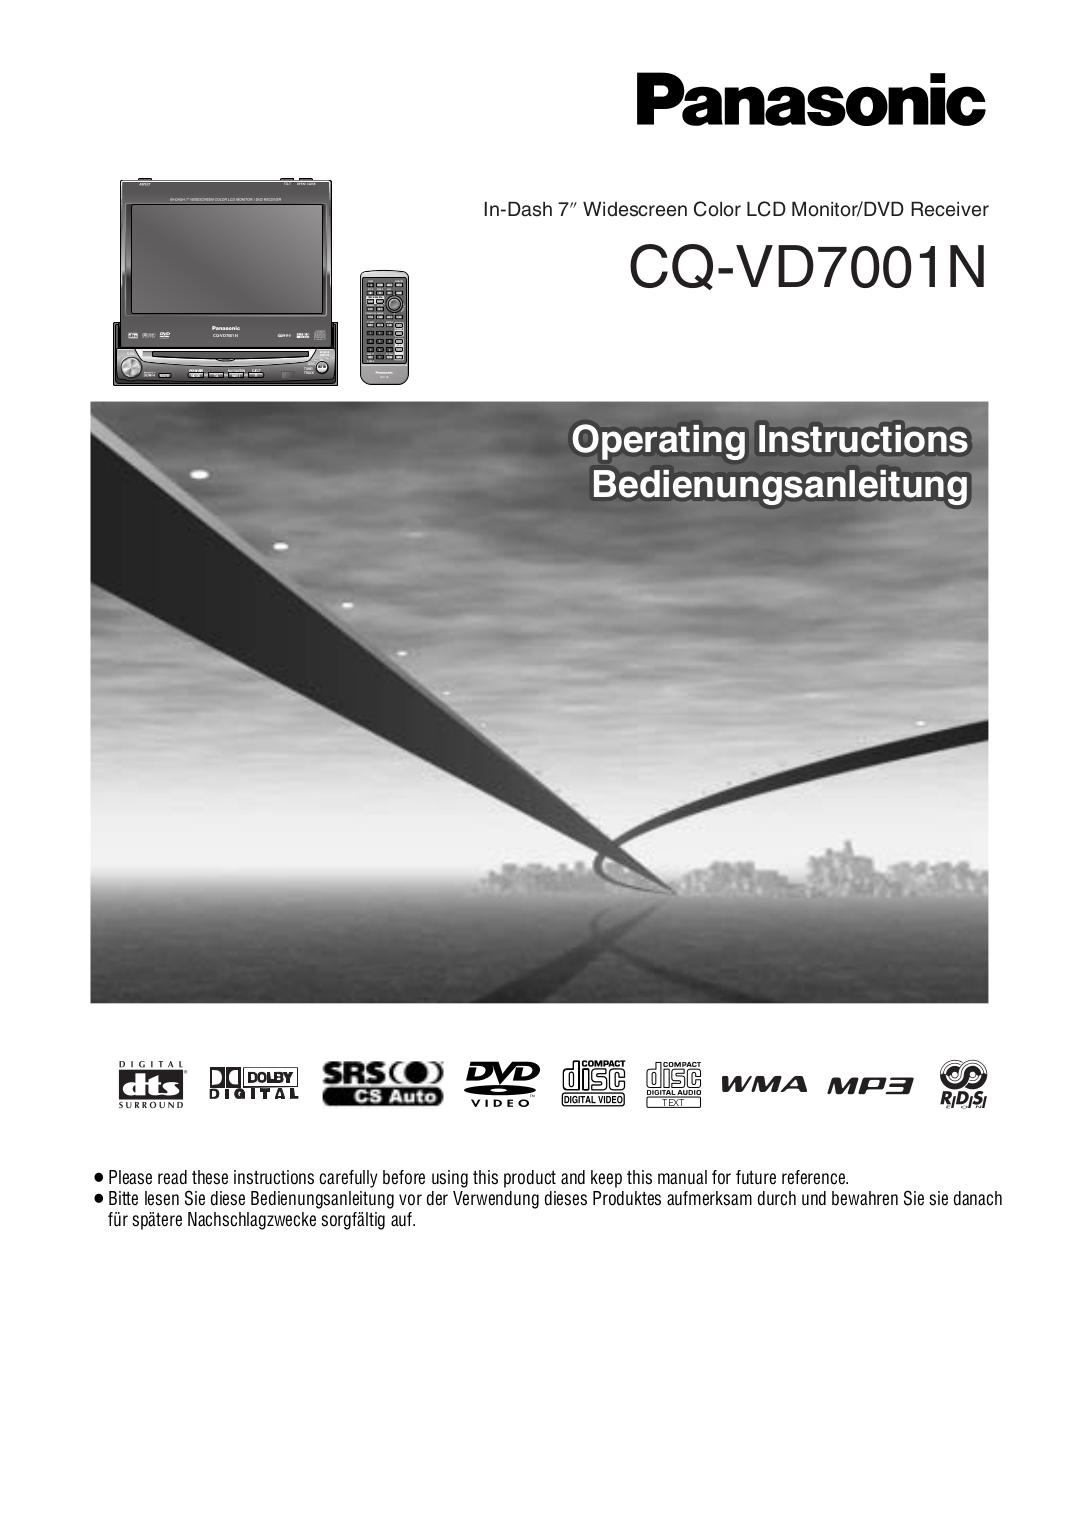 Pdf Manual For Panasonic Car Video Cq Vd7001u